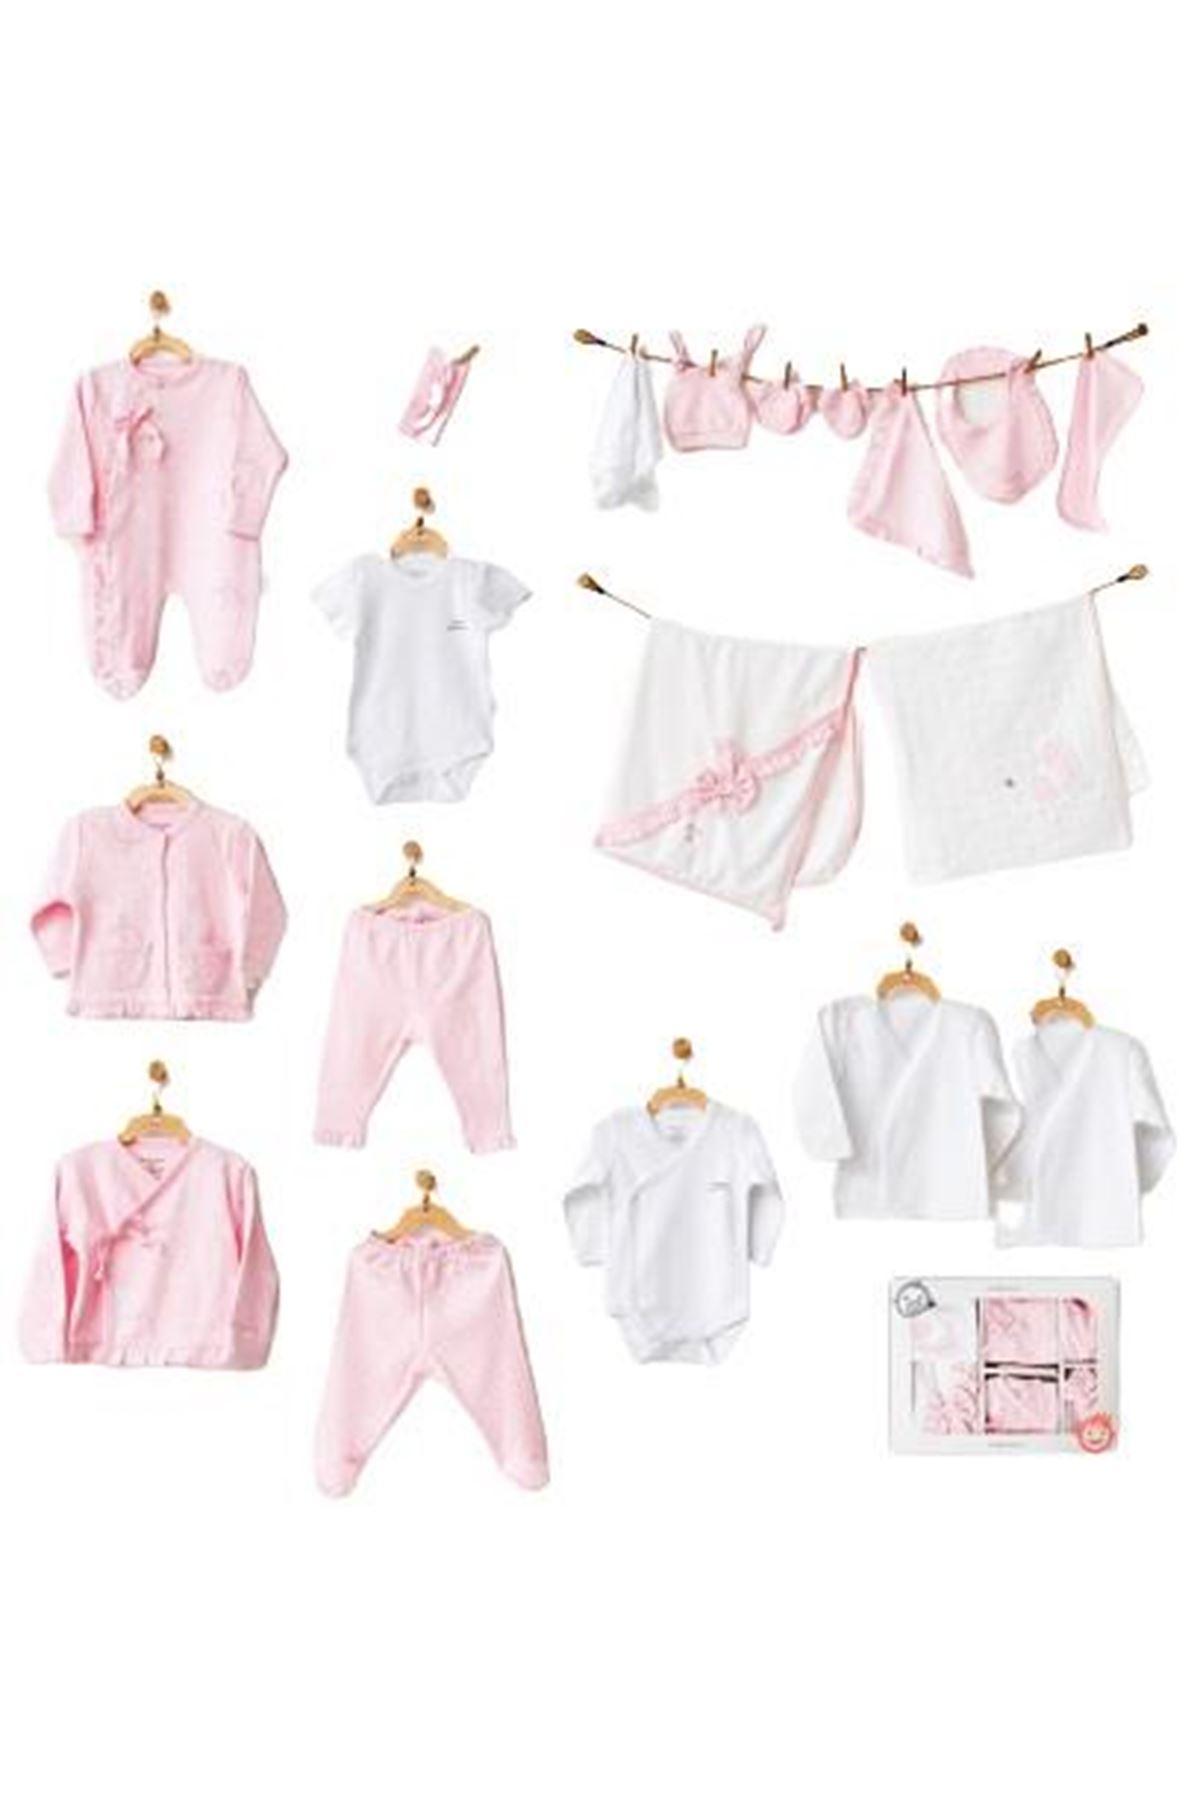 Andywawa AC21792 Milly Ballet Newborn 20 Parça Zıbın Seti Pink